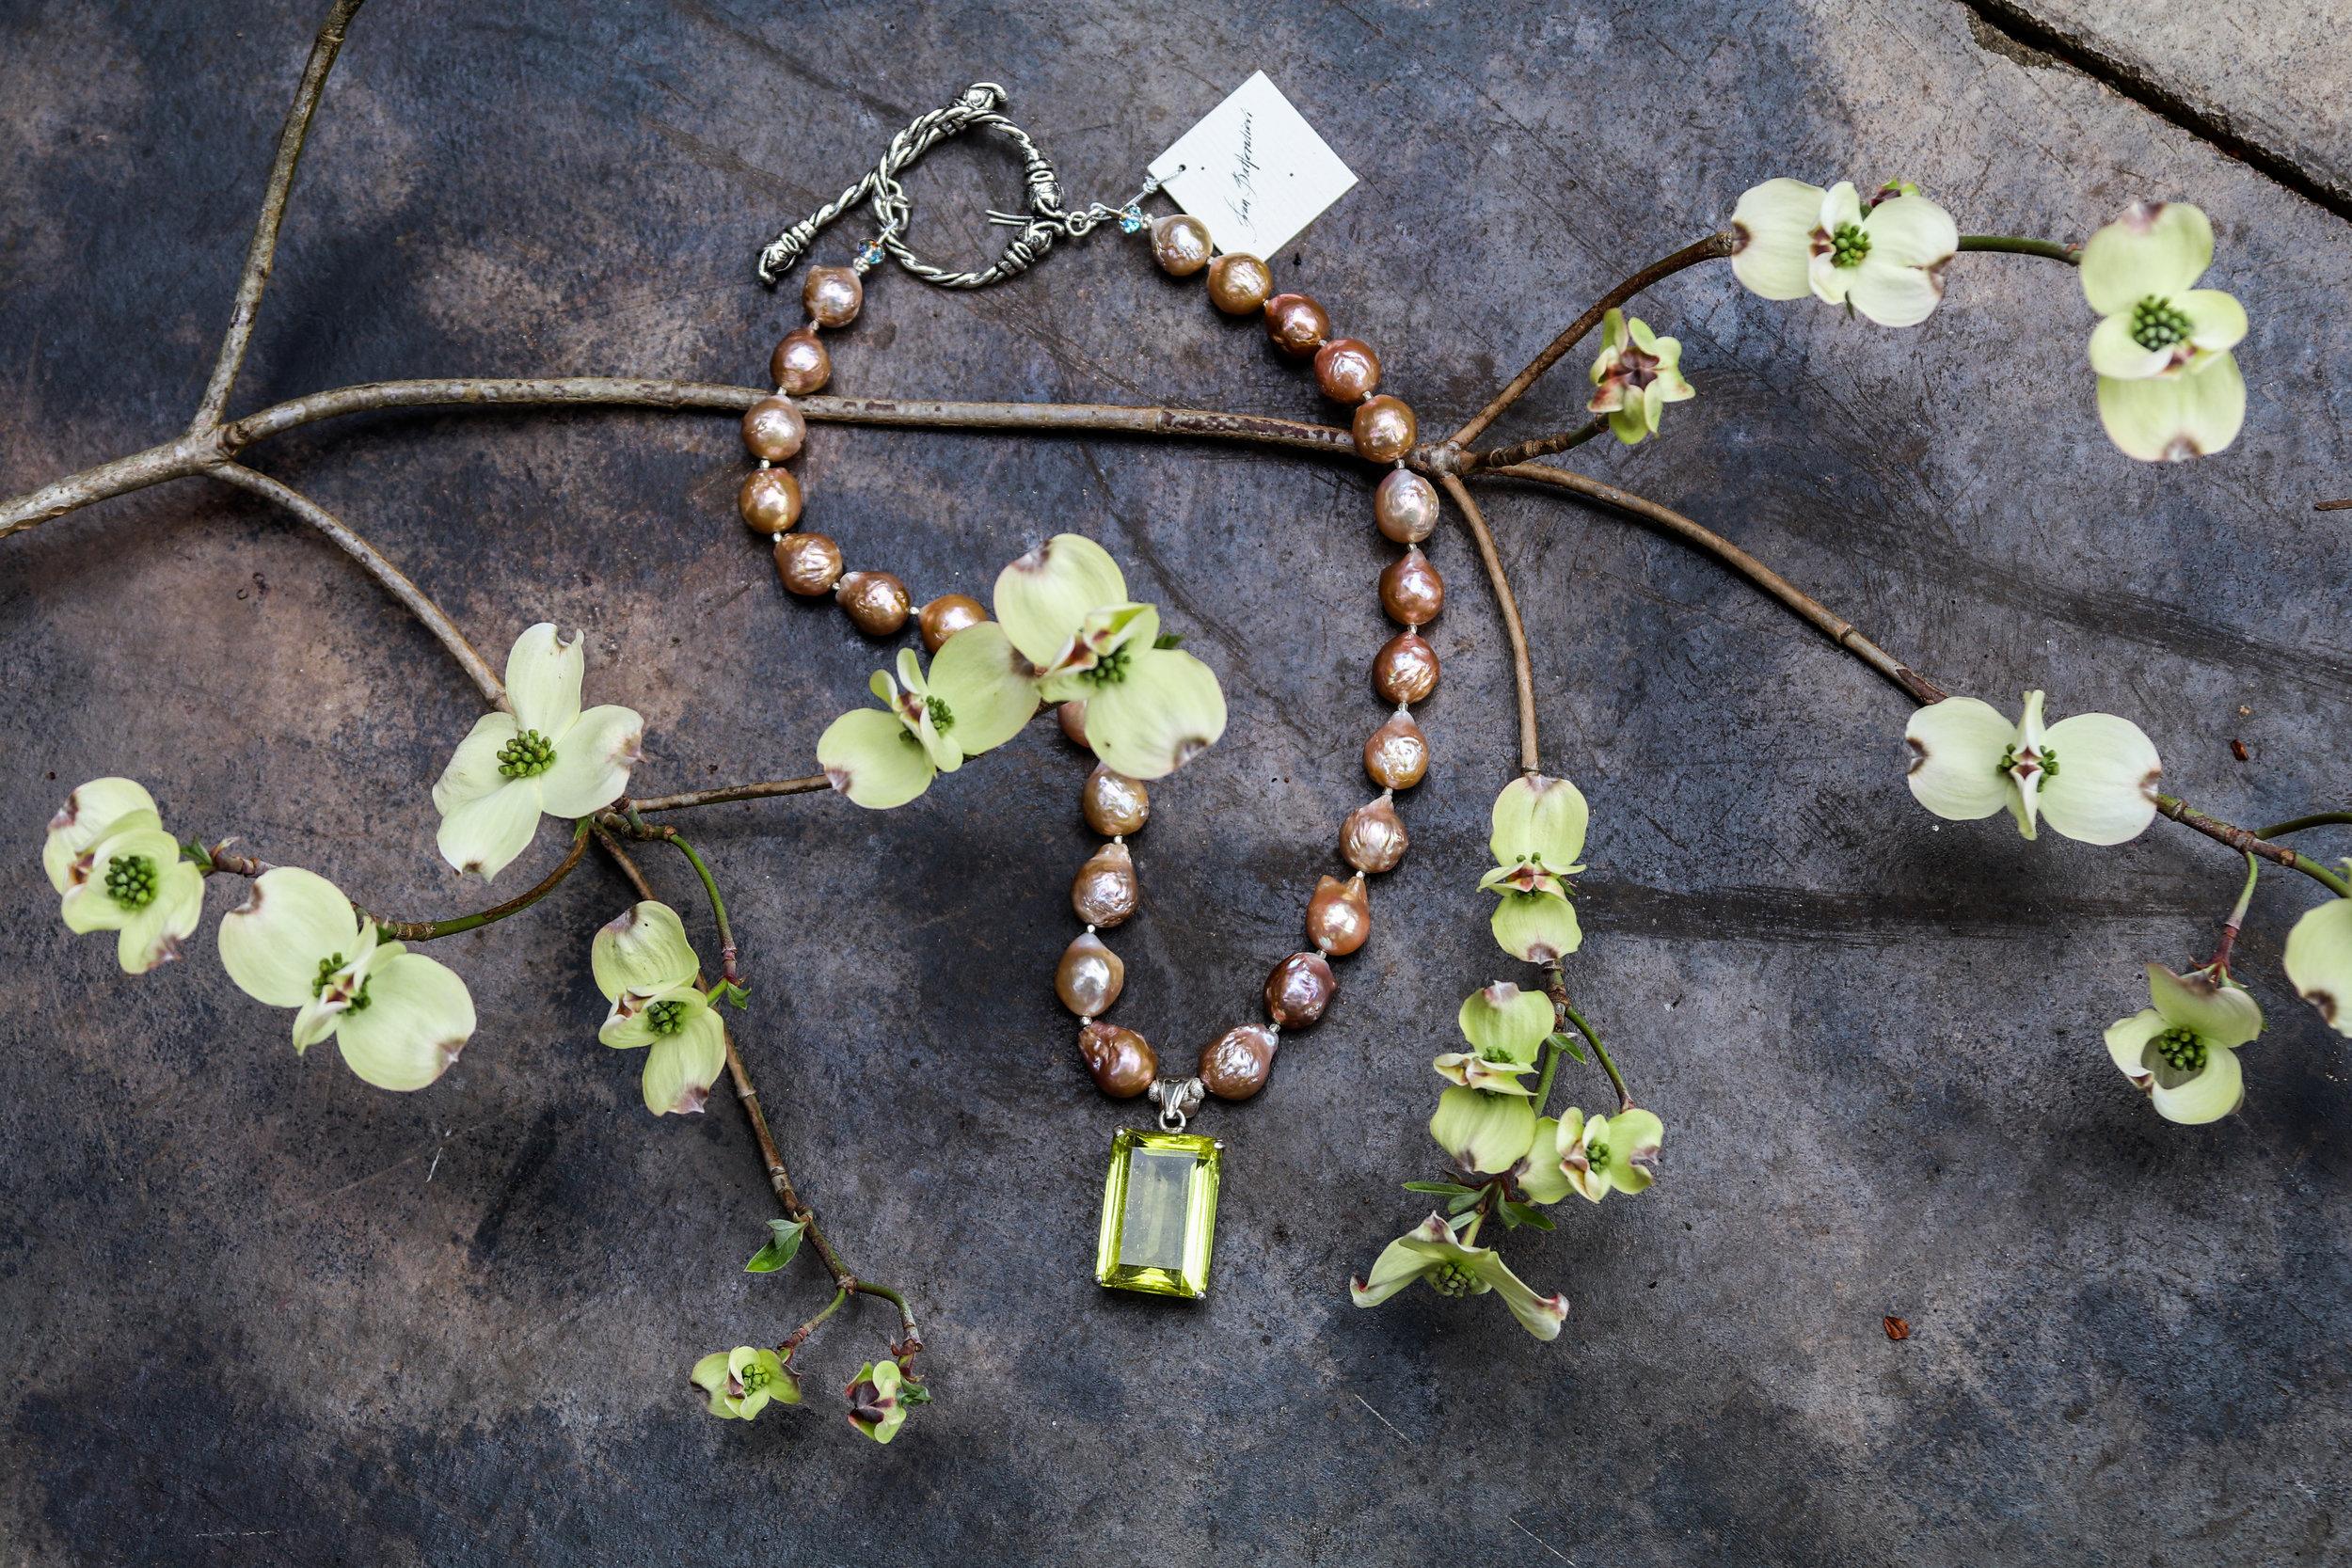 Enhanced Moss Green Quartz with Fresh Water Pearls